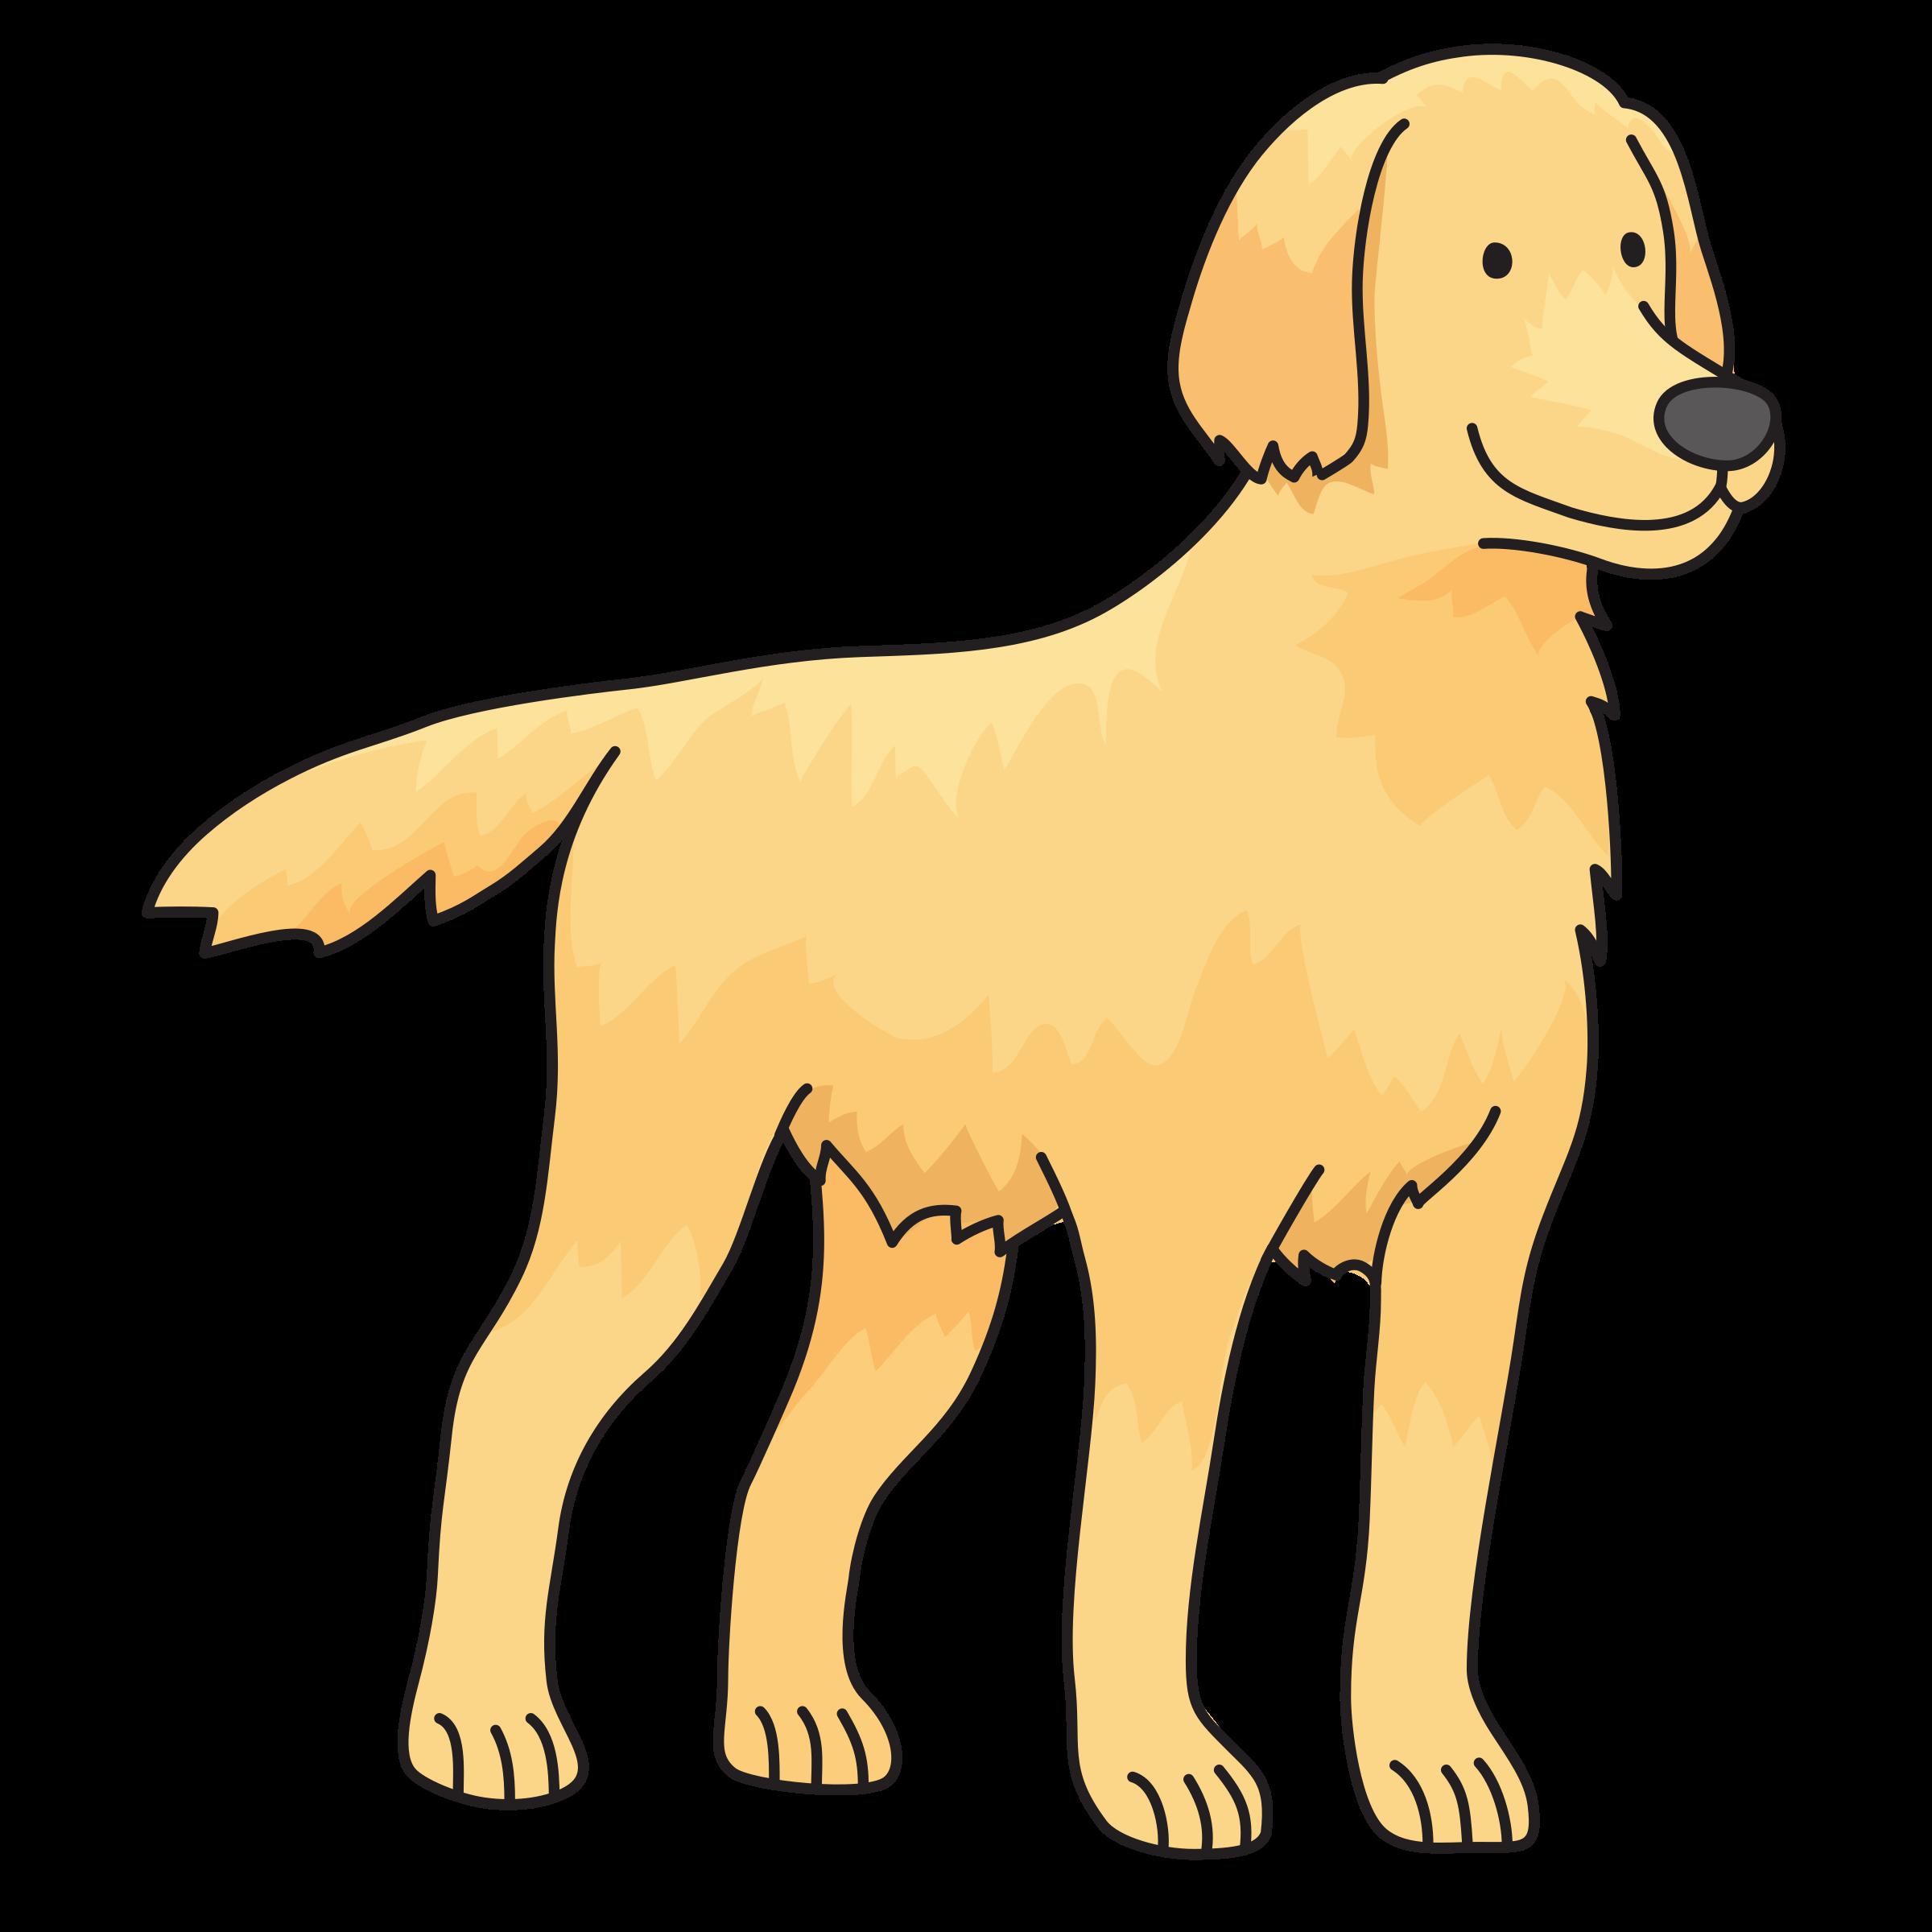 png transparent stock Dog big image png. Golden retriever clipart